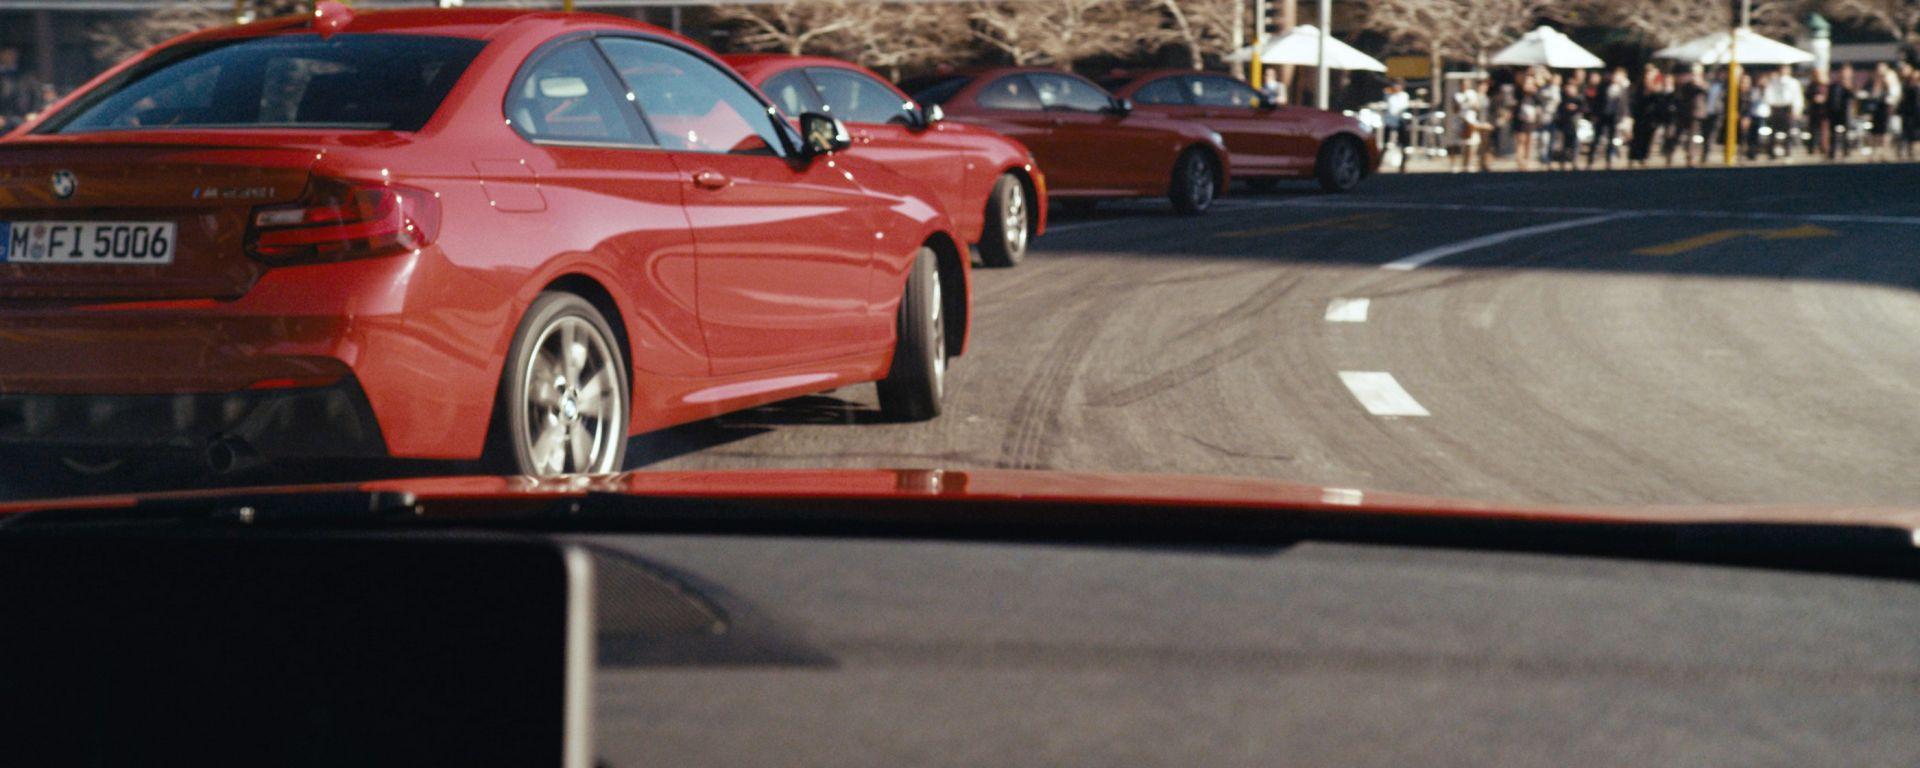 BMW M235i, The Epic Driftmob